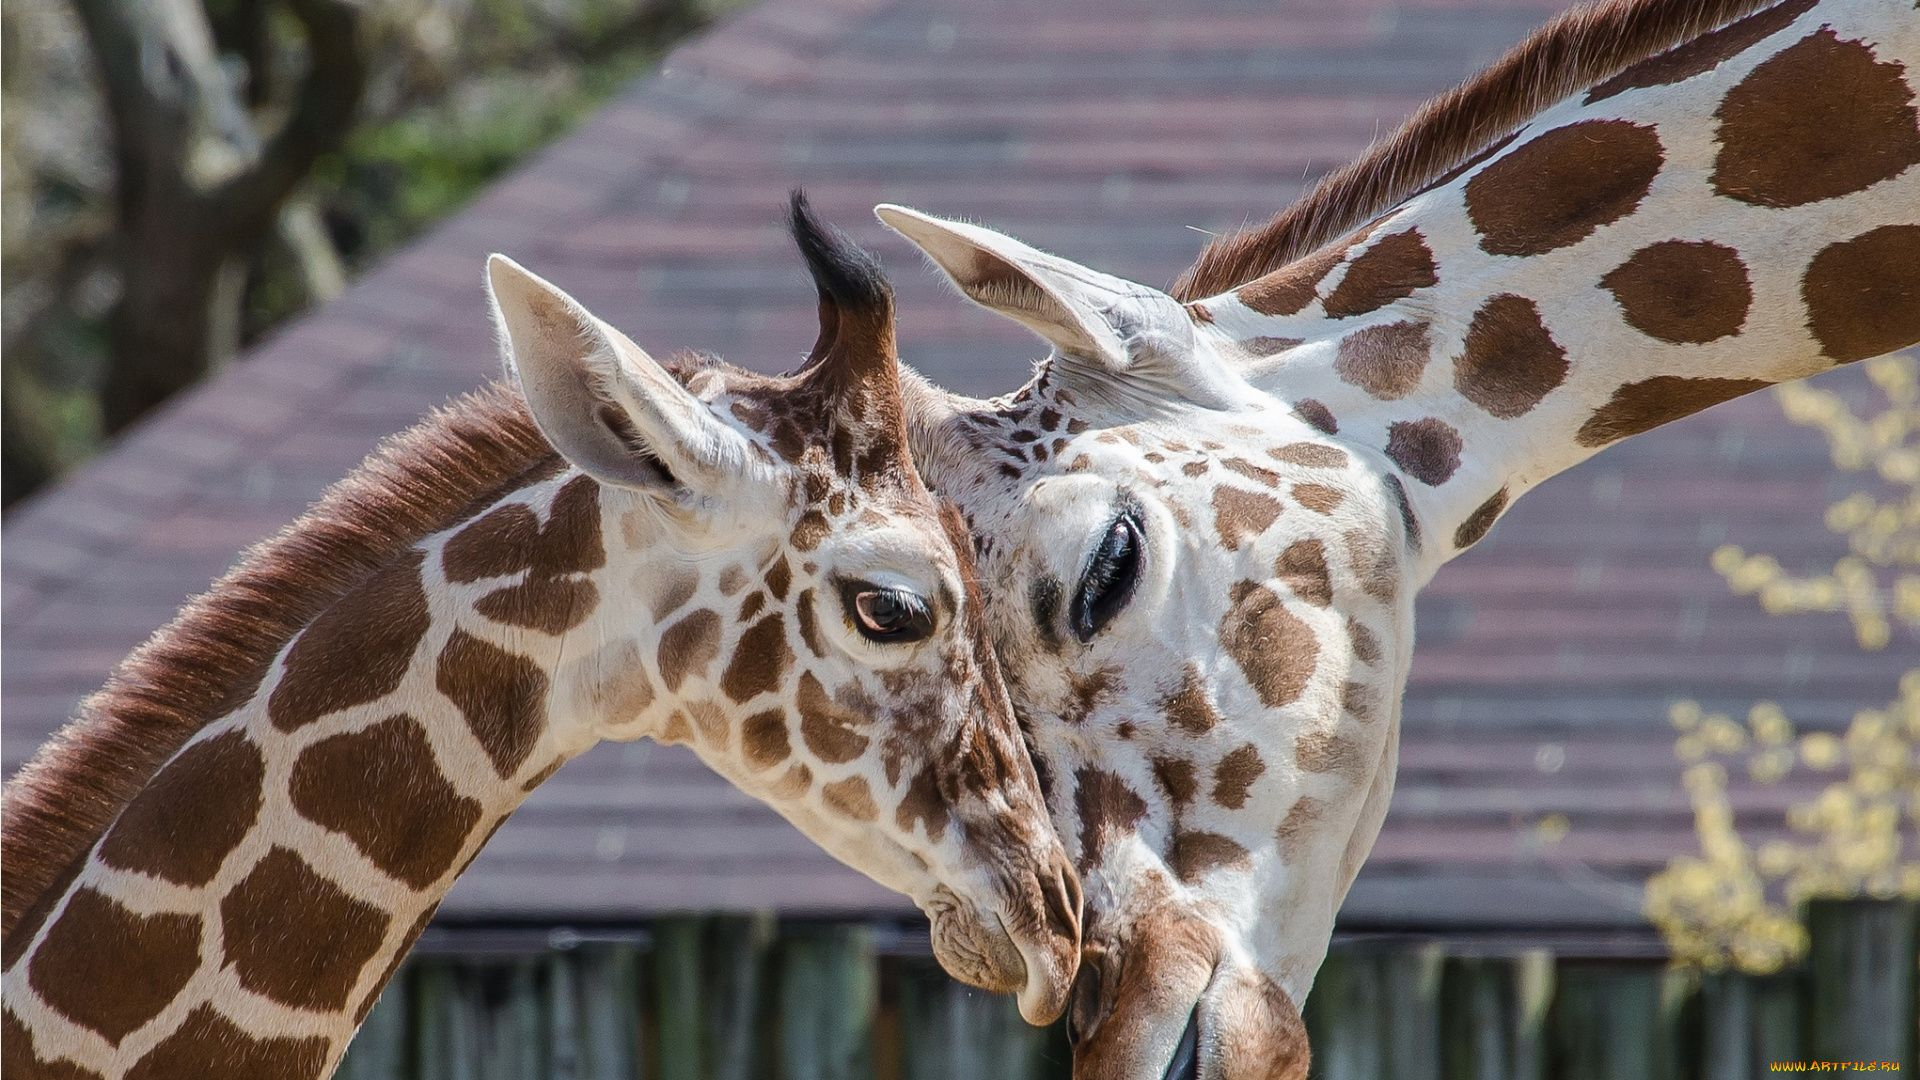 Funny Photo Of A Giraffe